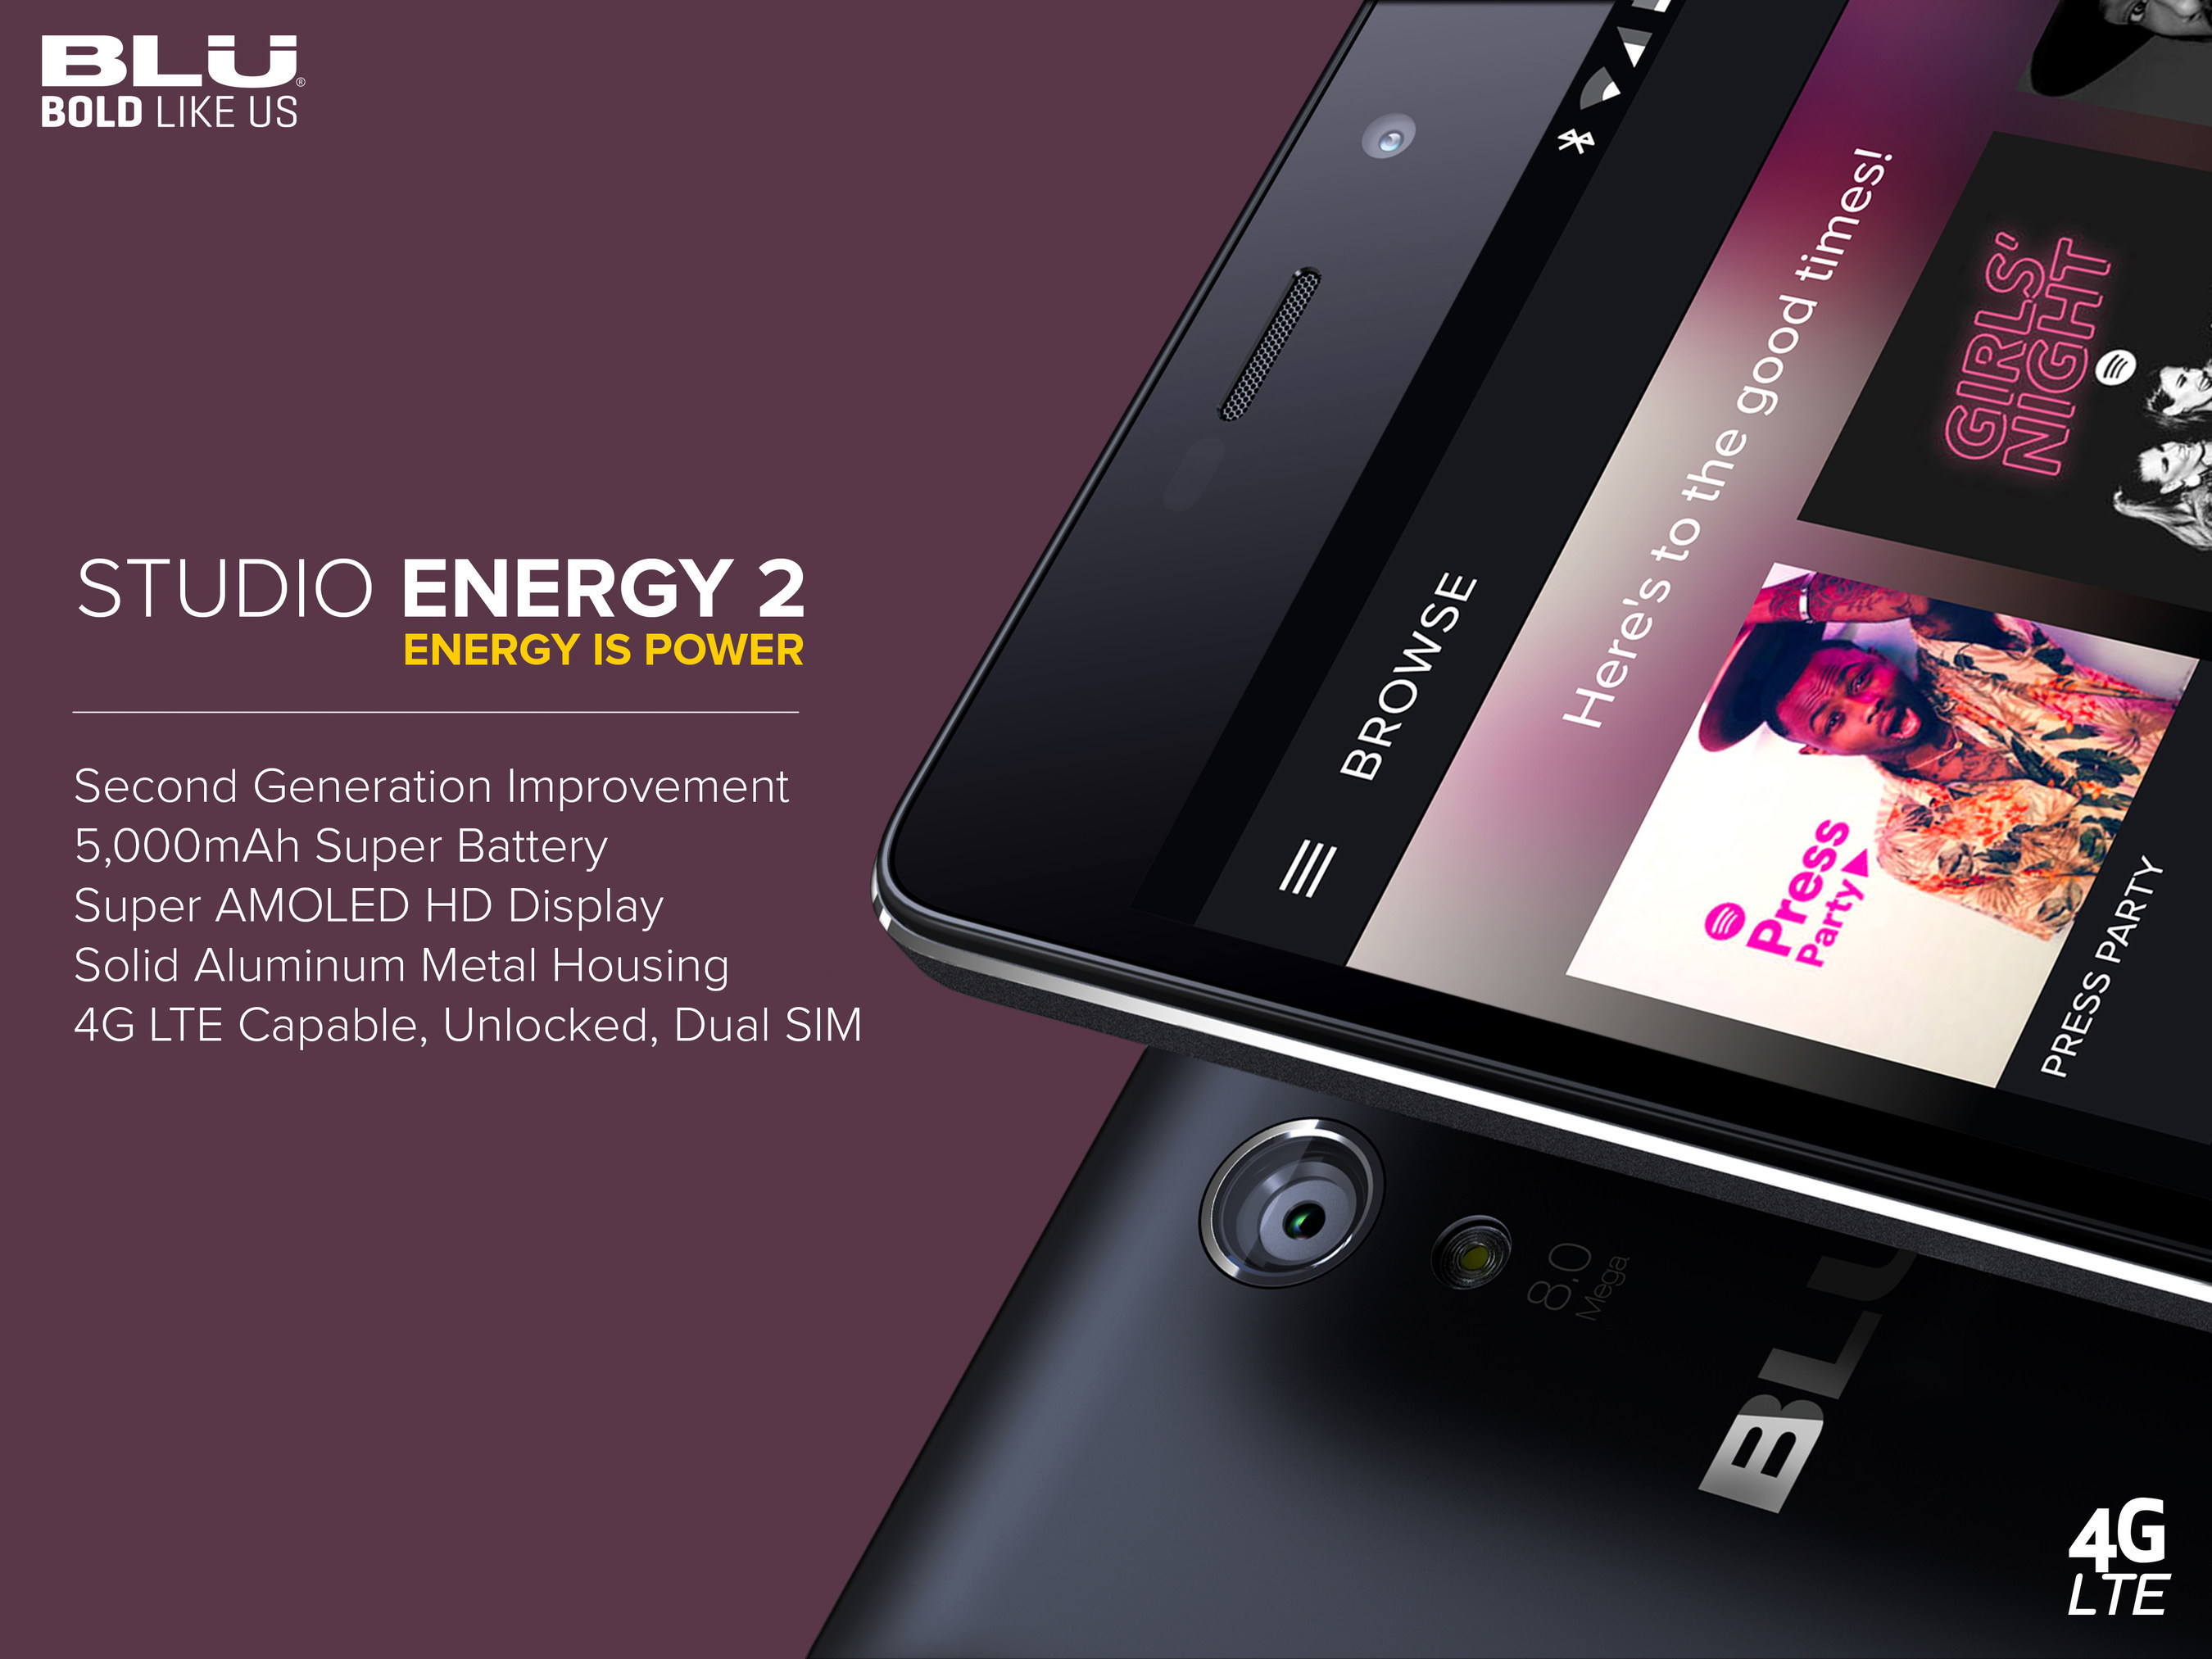 Studio Energy 2